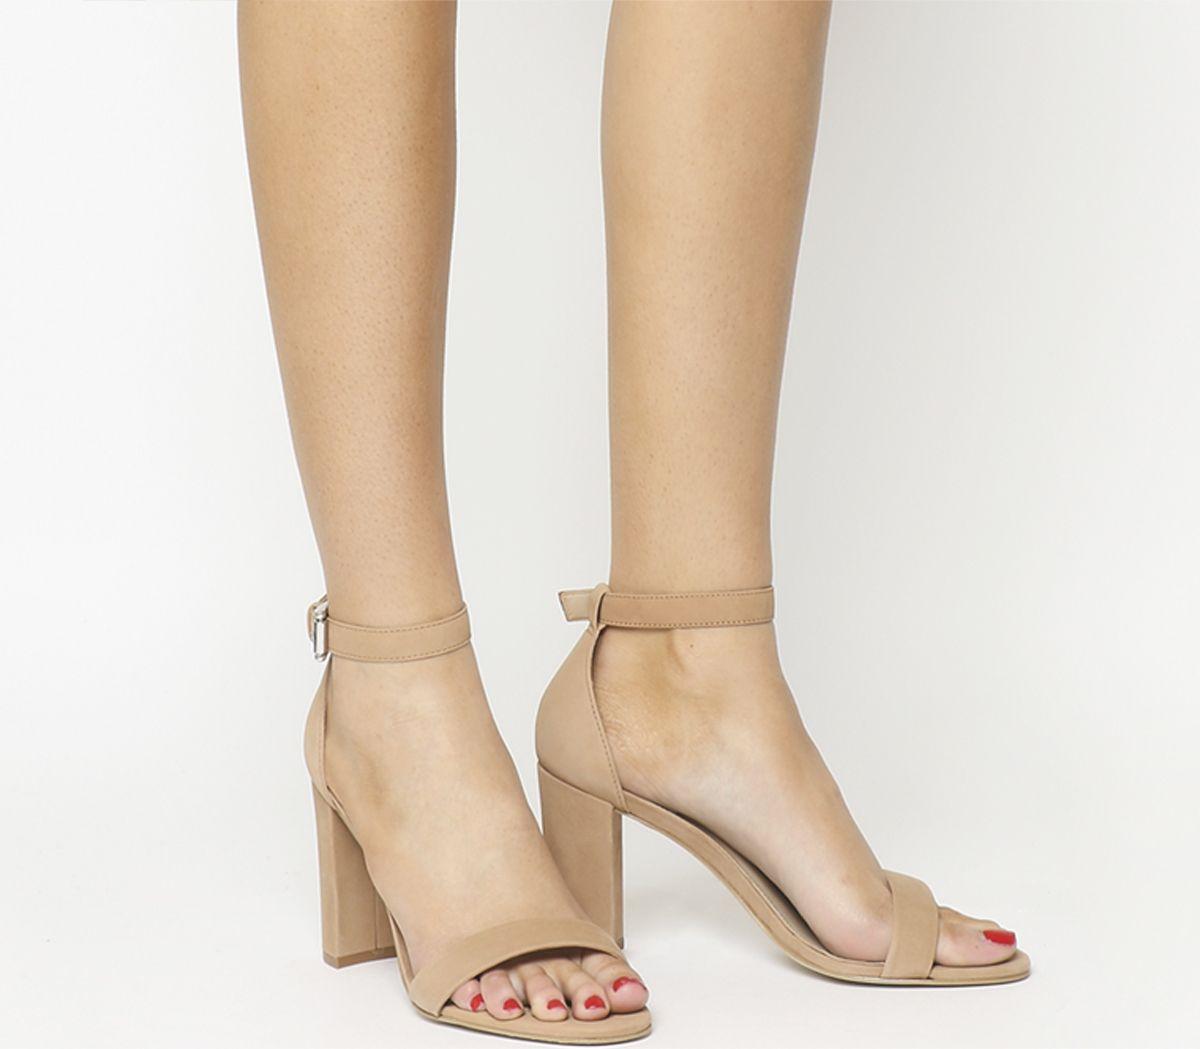 d23972b18ce5 Office Nina Block Heel Sandals Nude Nubuck - High Heels